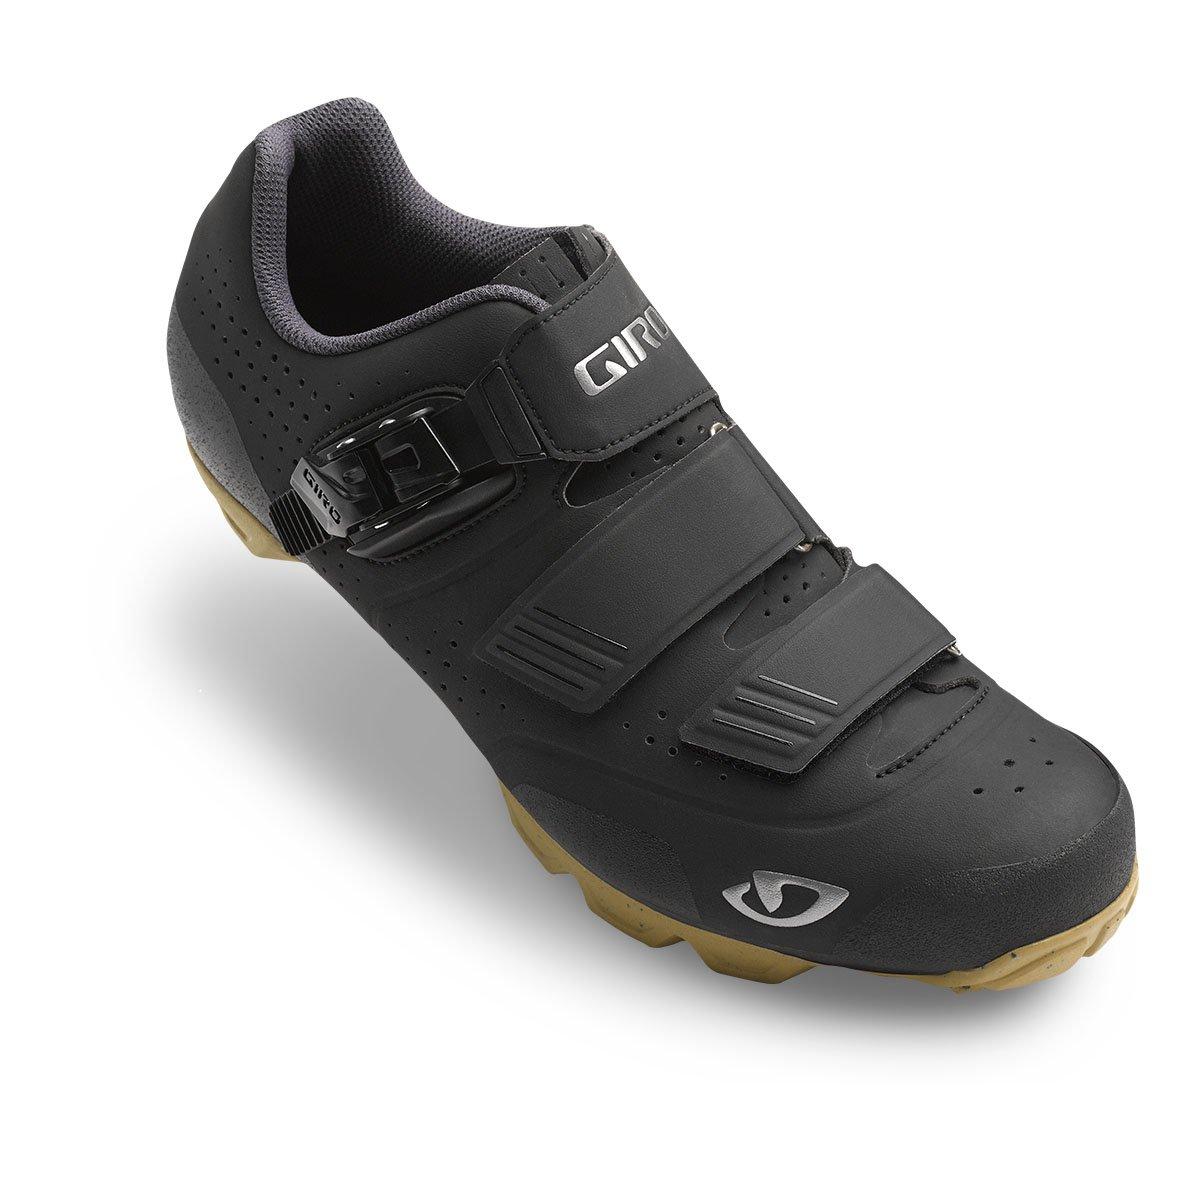 Giro Privateer R HV MTB Fahrrad Schuhe Schwarz 2019  Größe  42.5